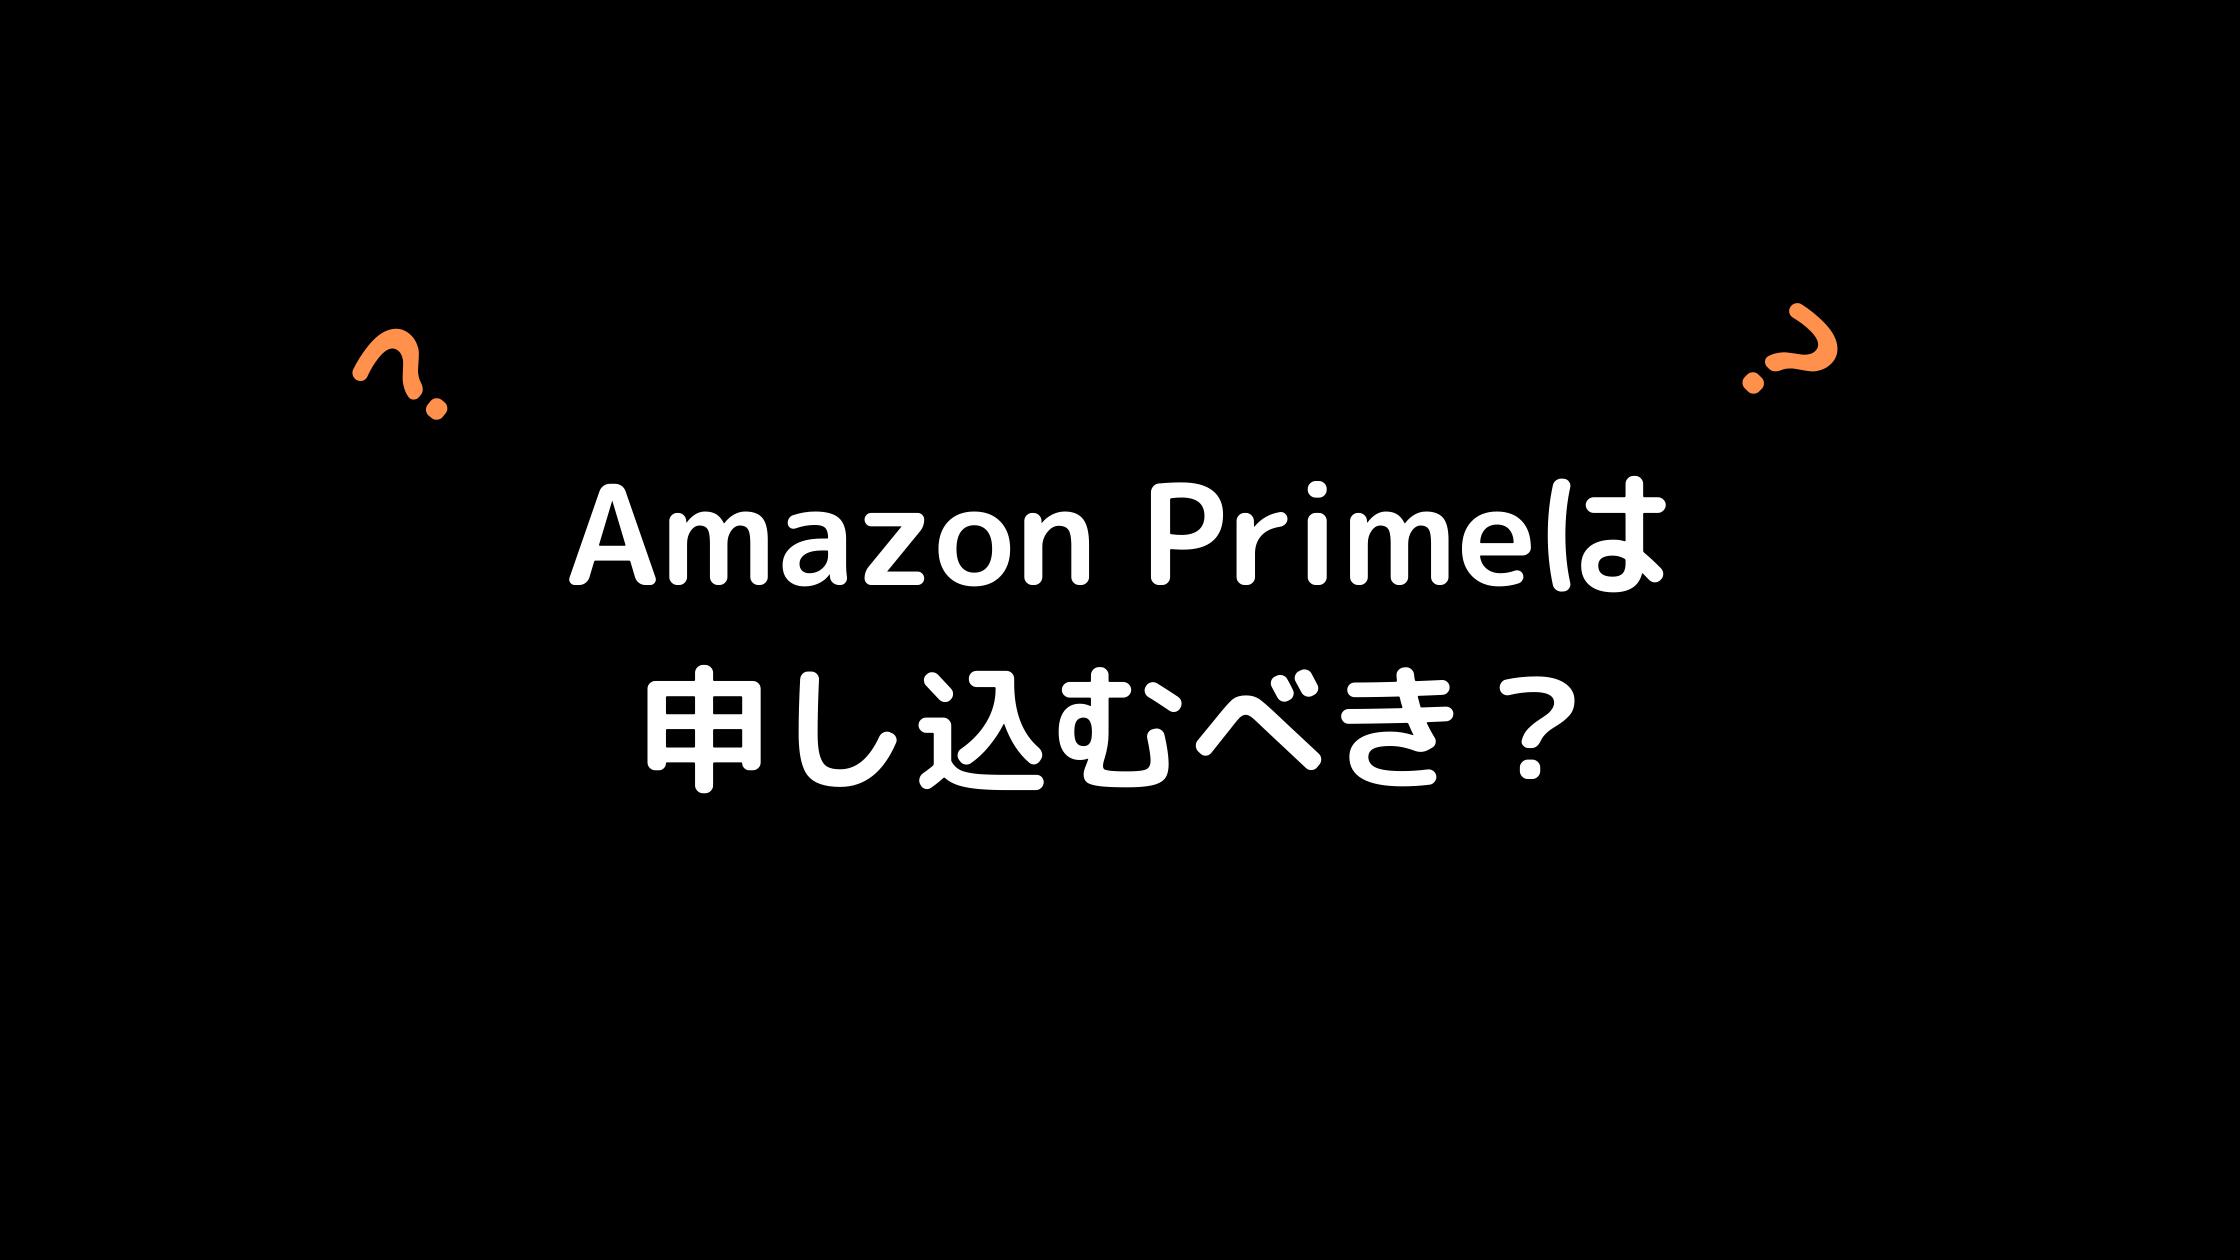 Amazon Primeは申し込むべき?のアイキャッチ